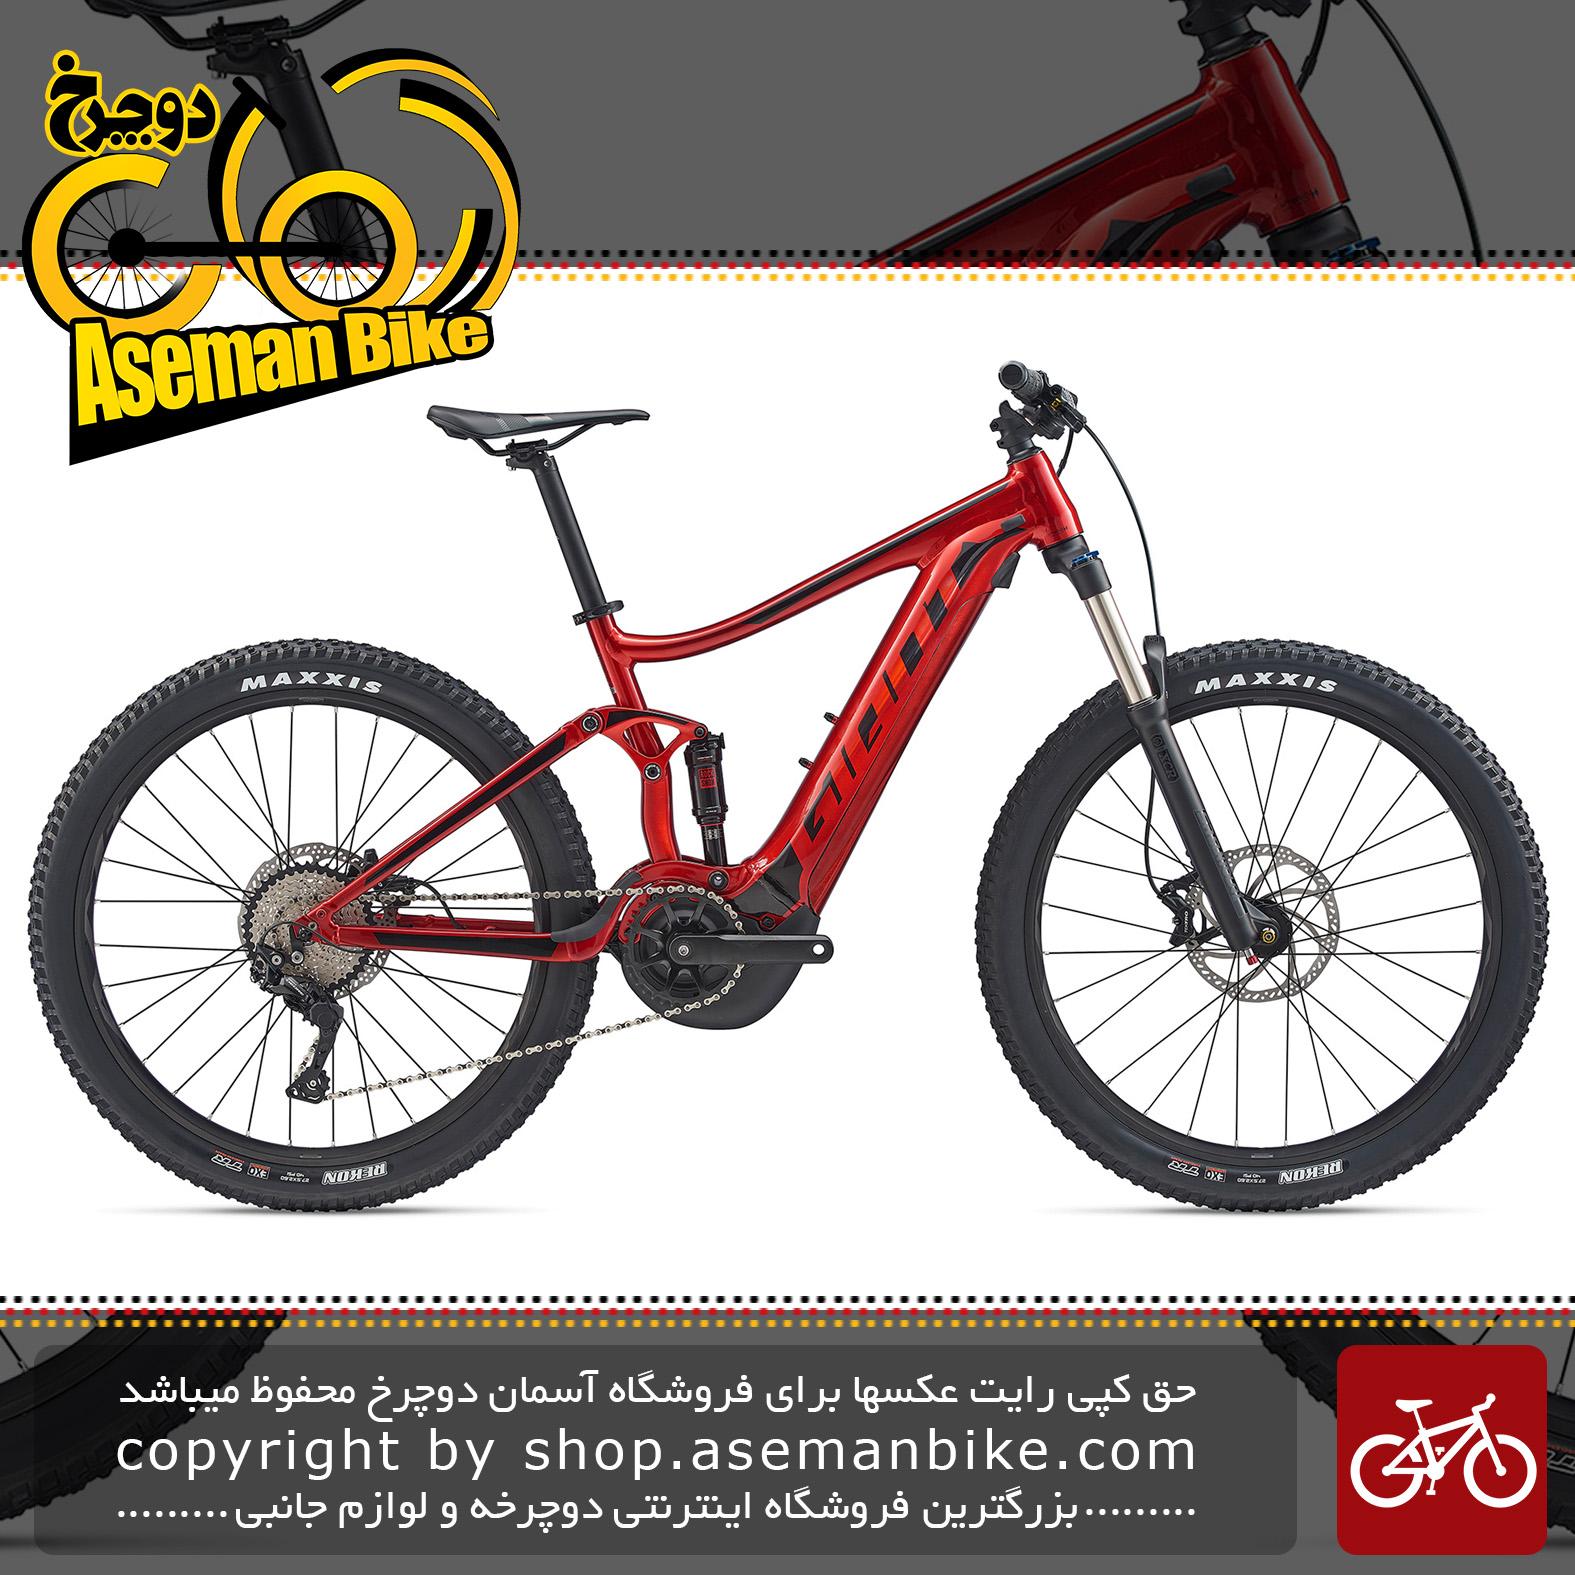 دوچرخه کوهستان برقی جاینت مدل استنس ای پلاس 2 پاور 2020 Giant Mountain Bicycle Stance E+ 2 Power 2020